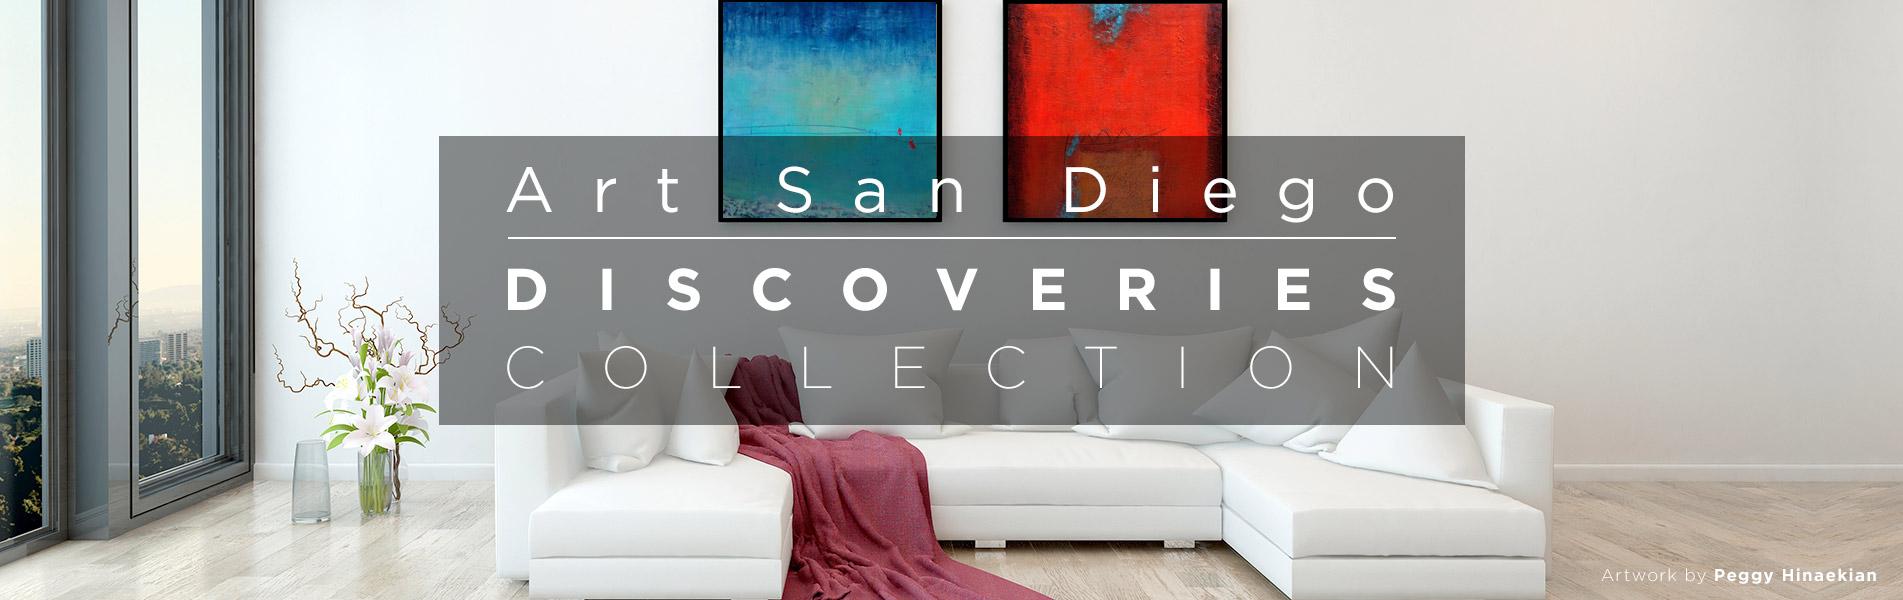 ASD Discoveries Collection